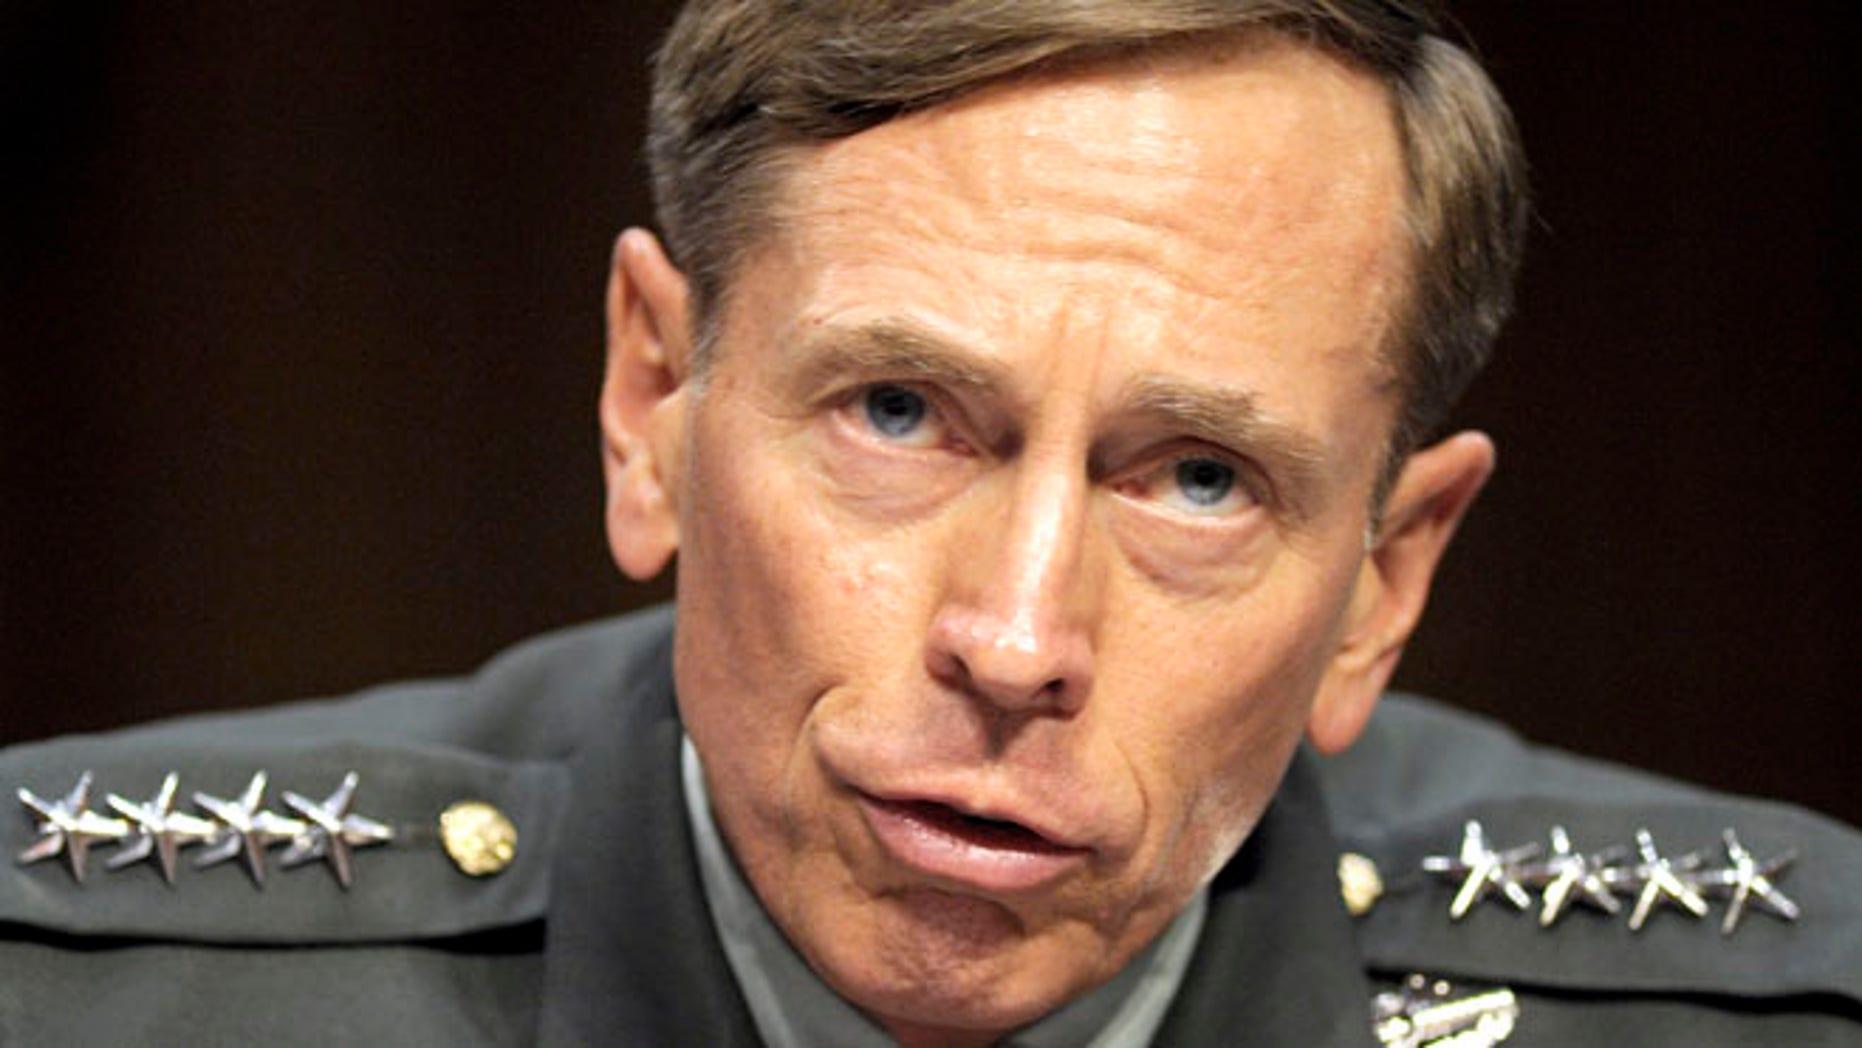 June 23, 2011: In this file photo, then-CIA Director-desigate Gen. David Petraeus testifies on Capitol Hill in Washington.